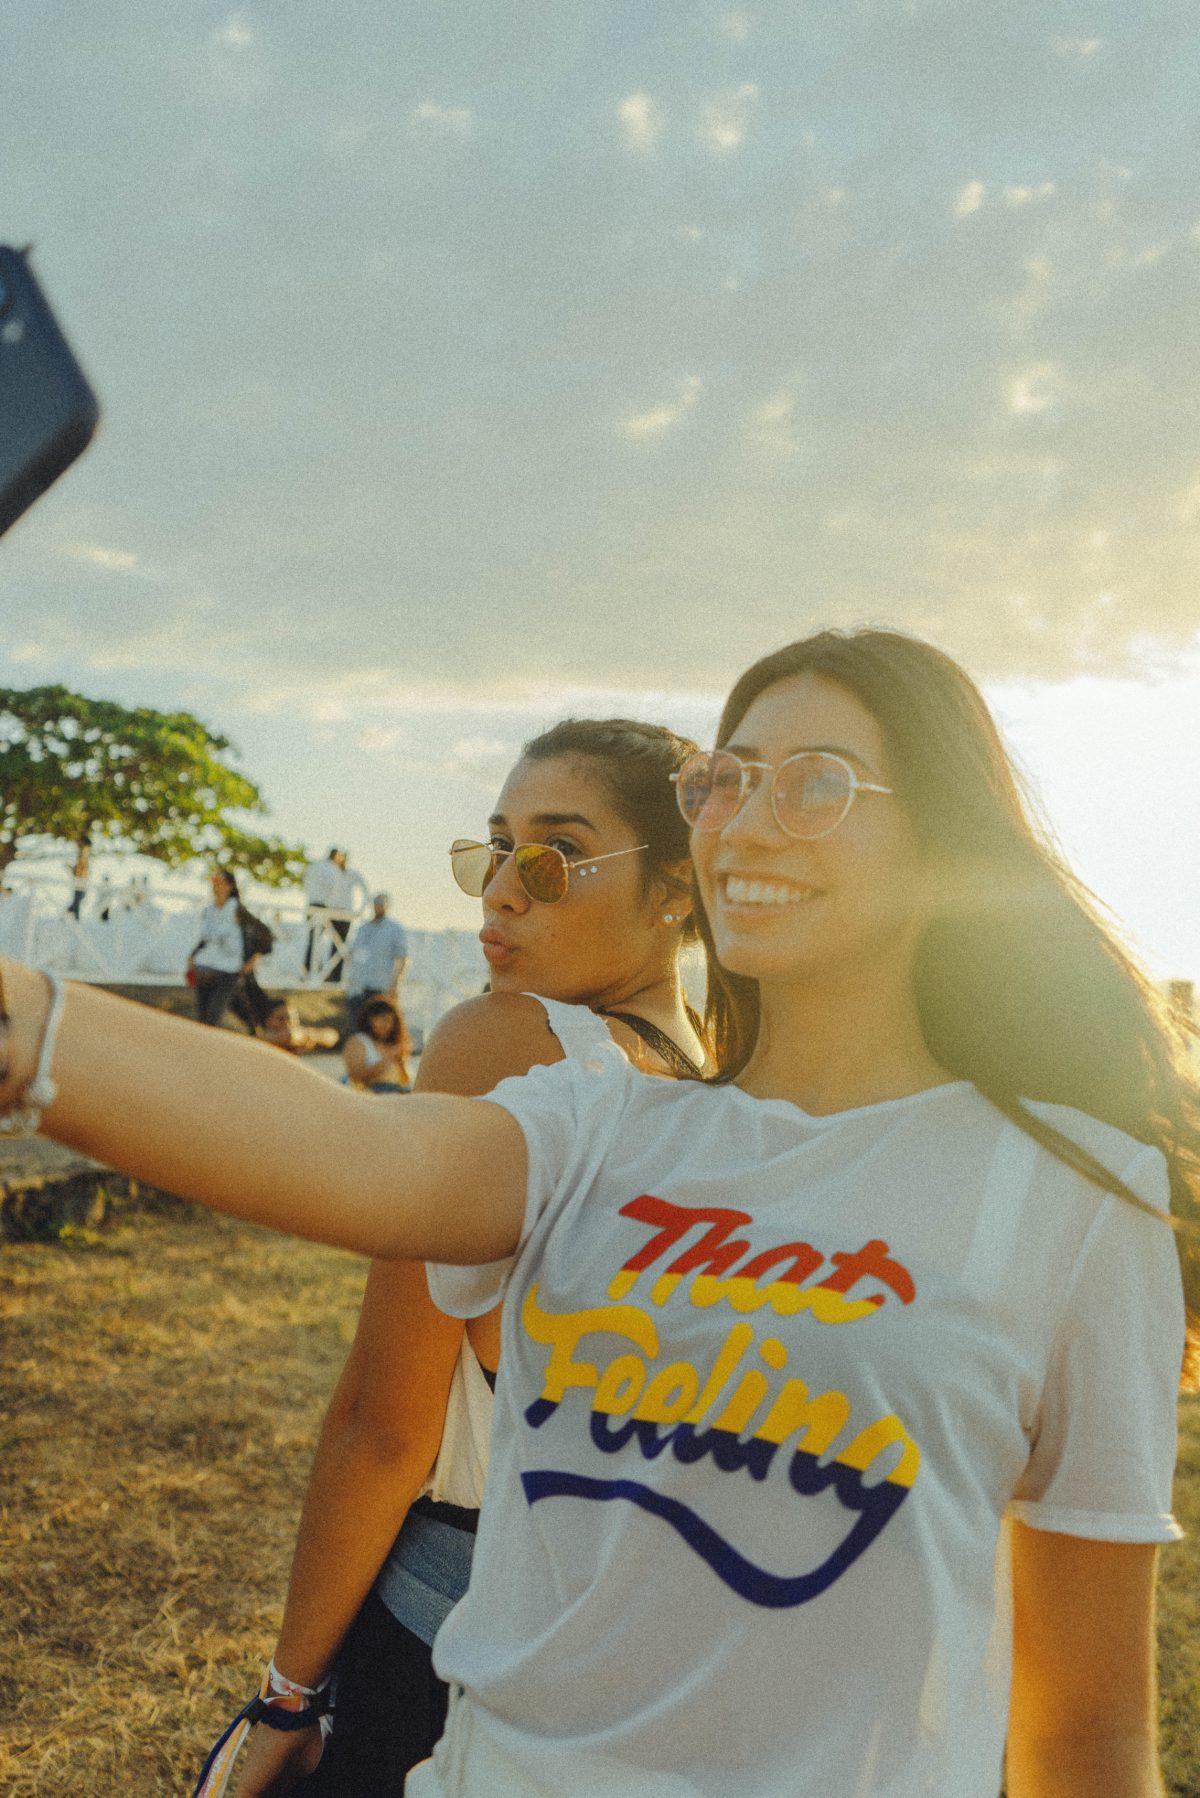 Selfie of young girls